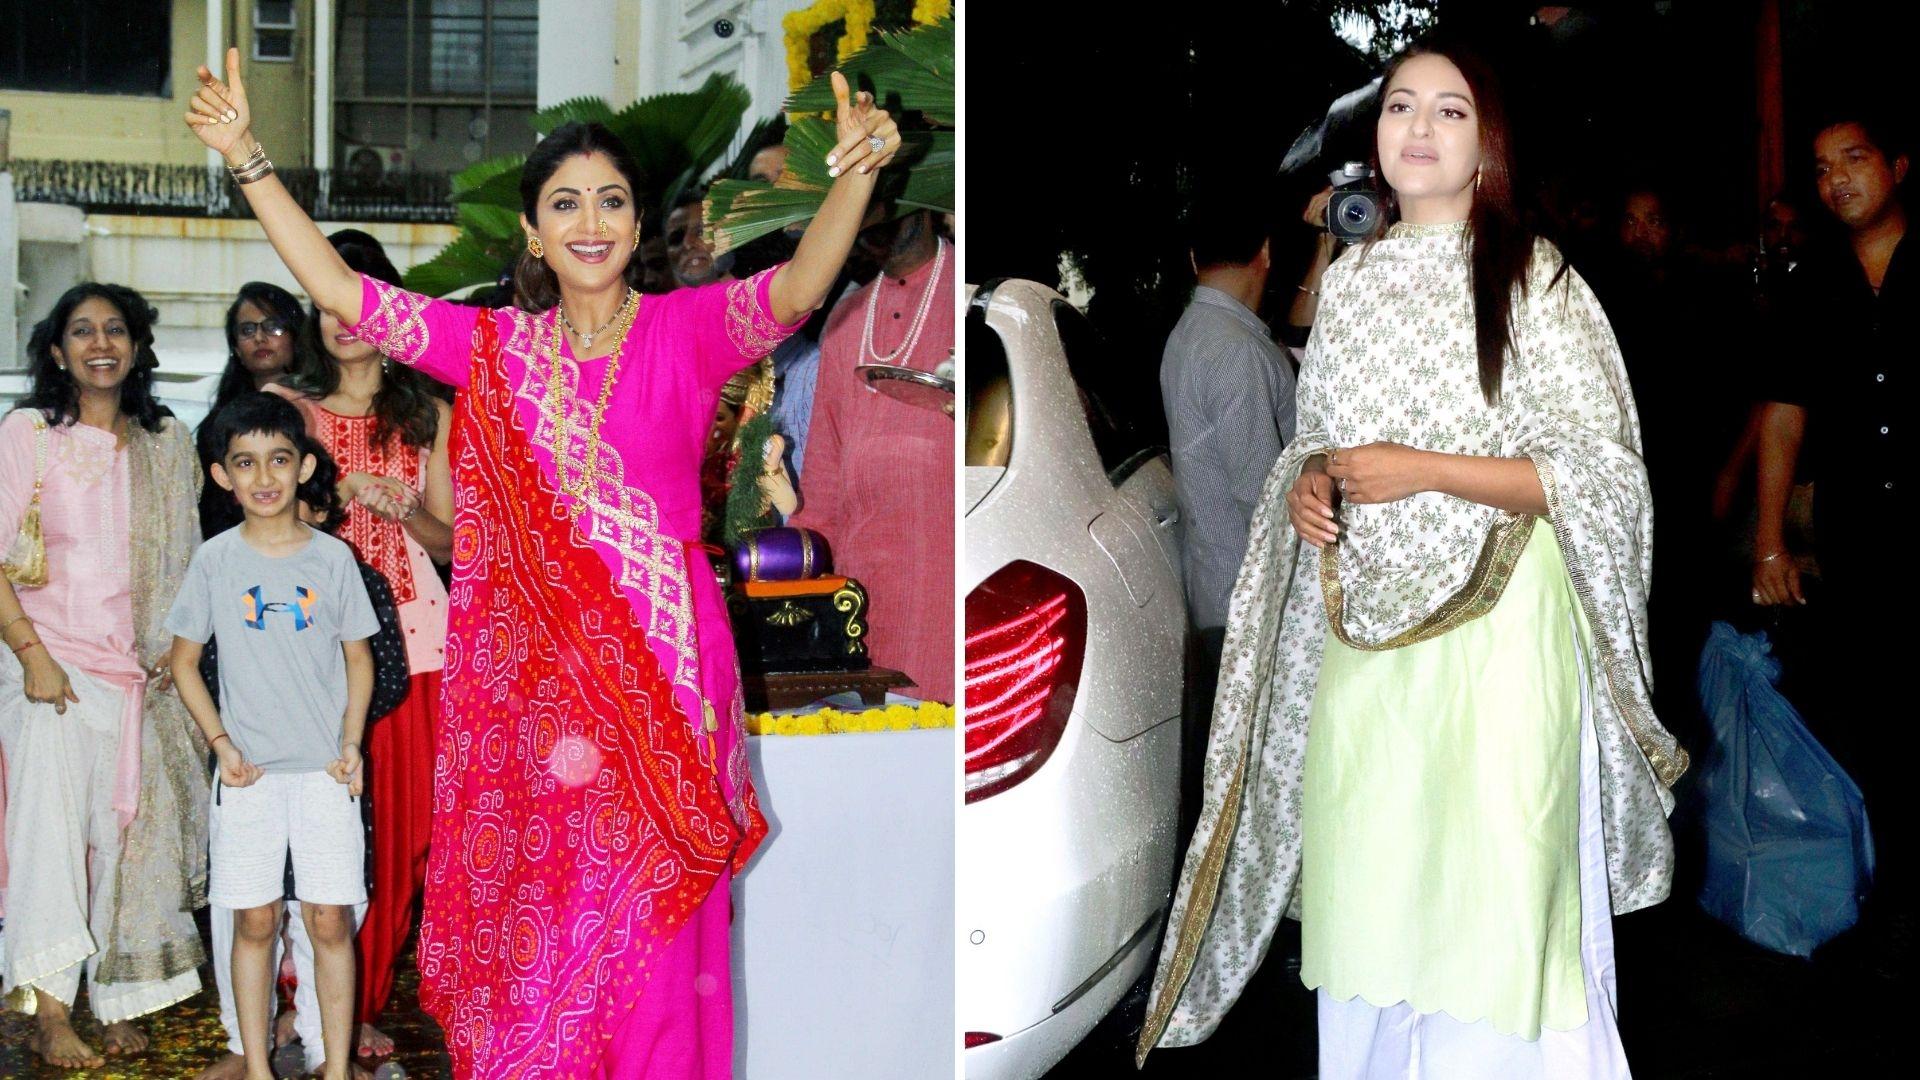 In Pics: Shilpa Shetty, Sonakshi Bid Goodbye to Ganpati Bappa